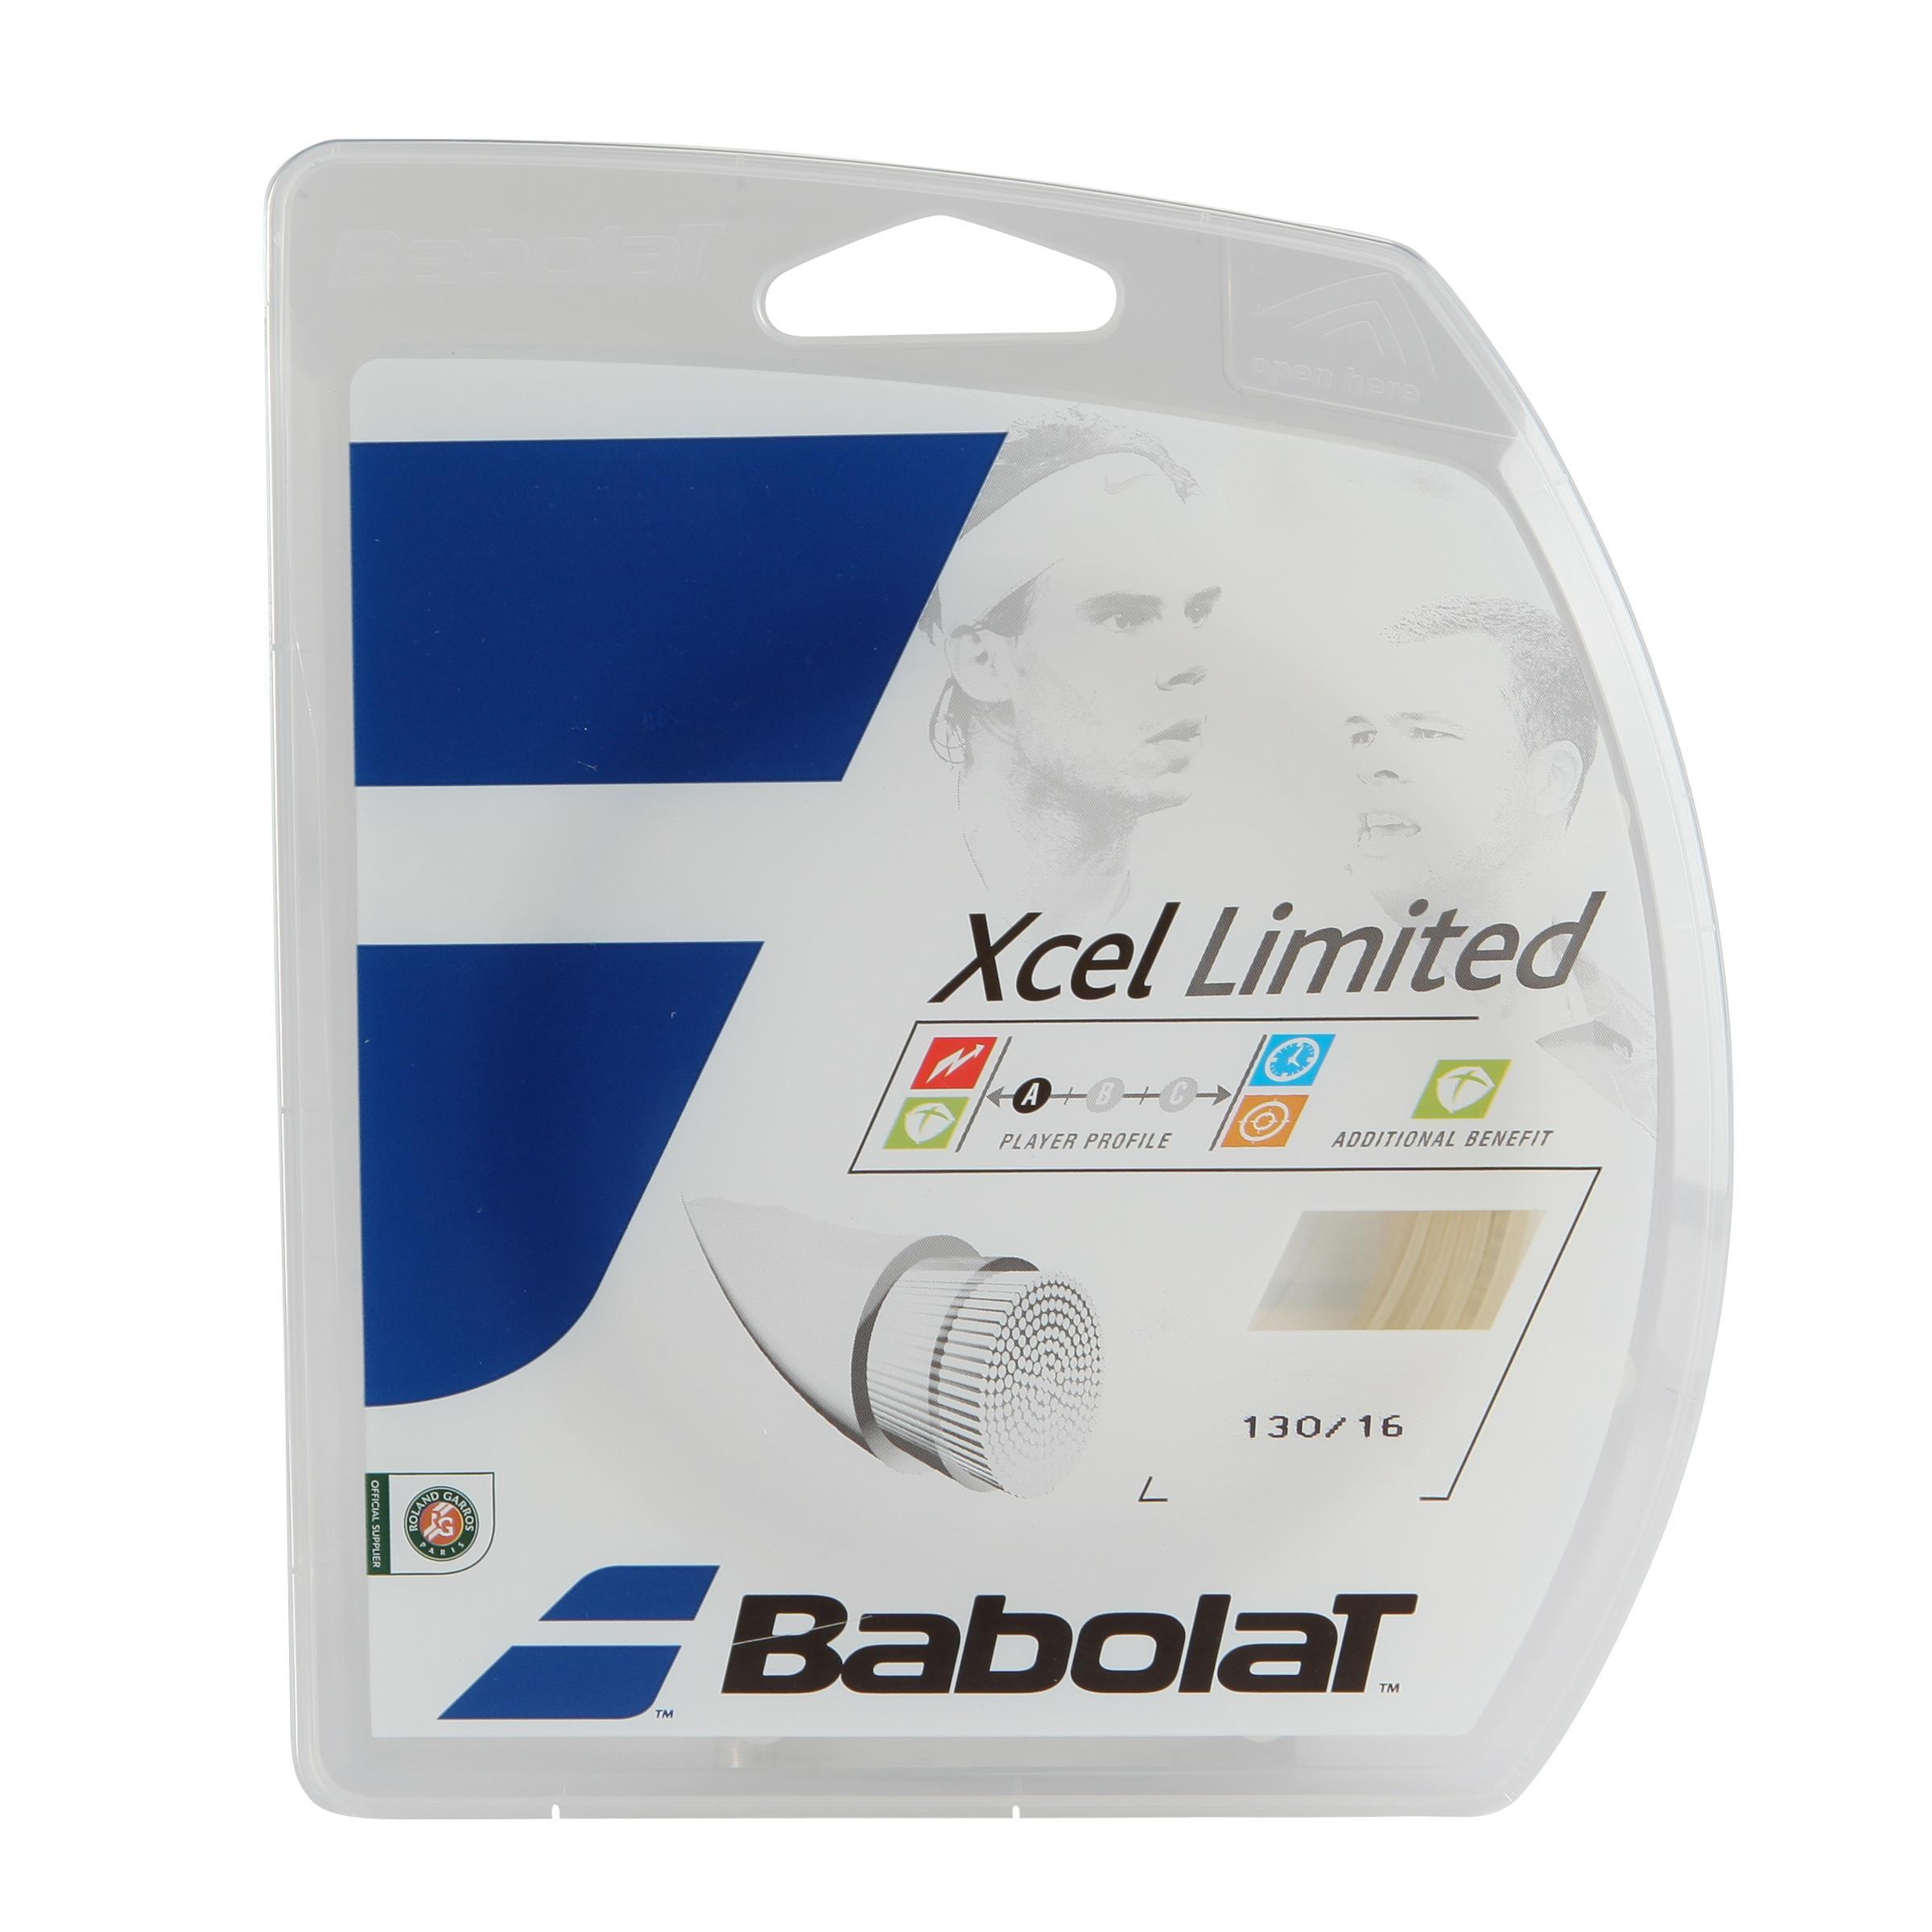 Babolat Tennisbesnaring Babolat Xcel Limited 1,30 mm multifilament natuurlijk